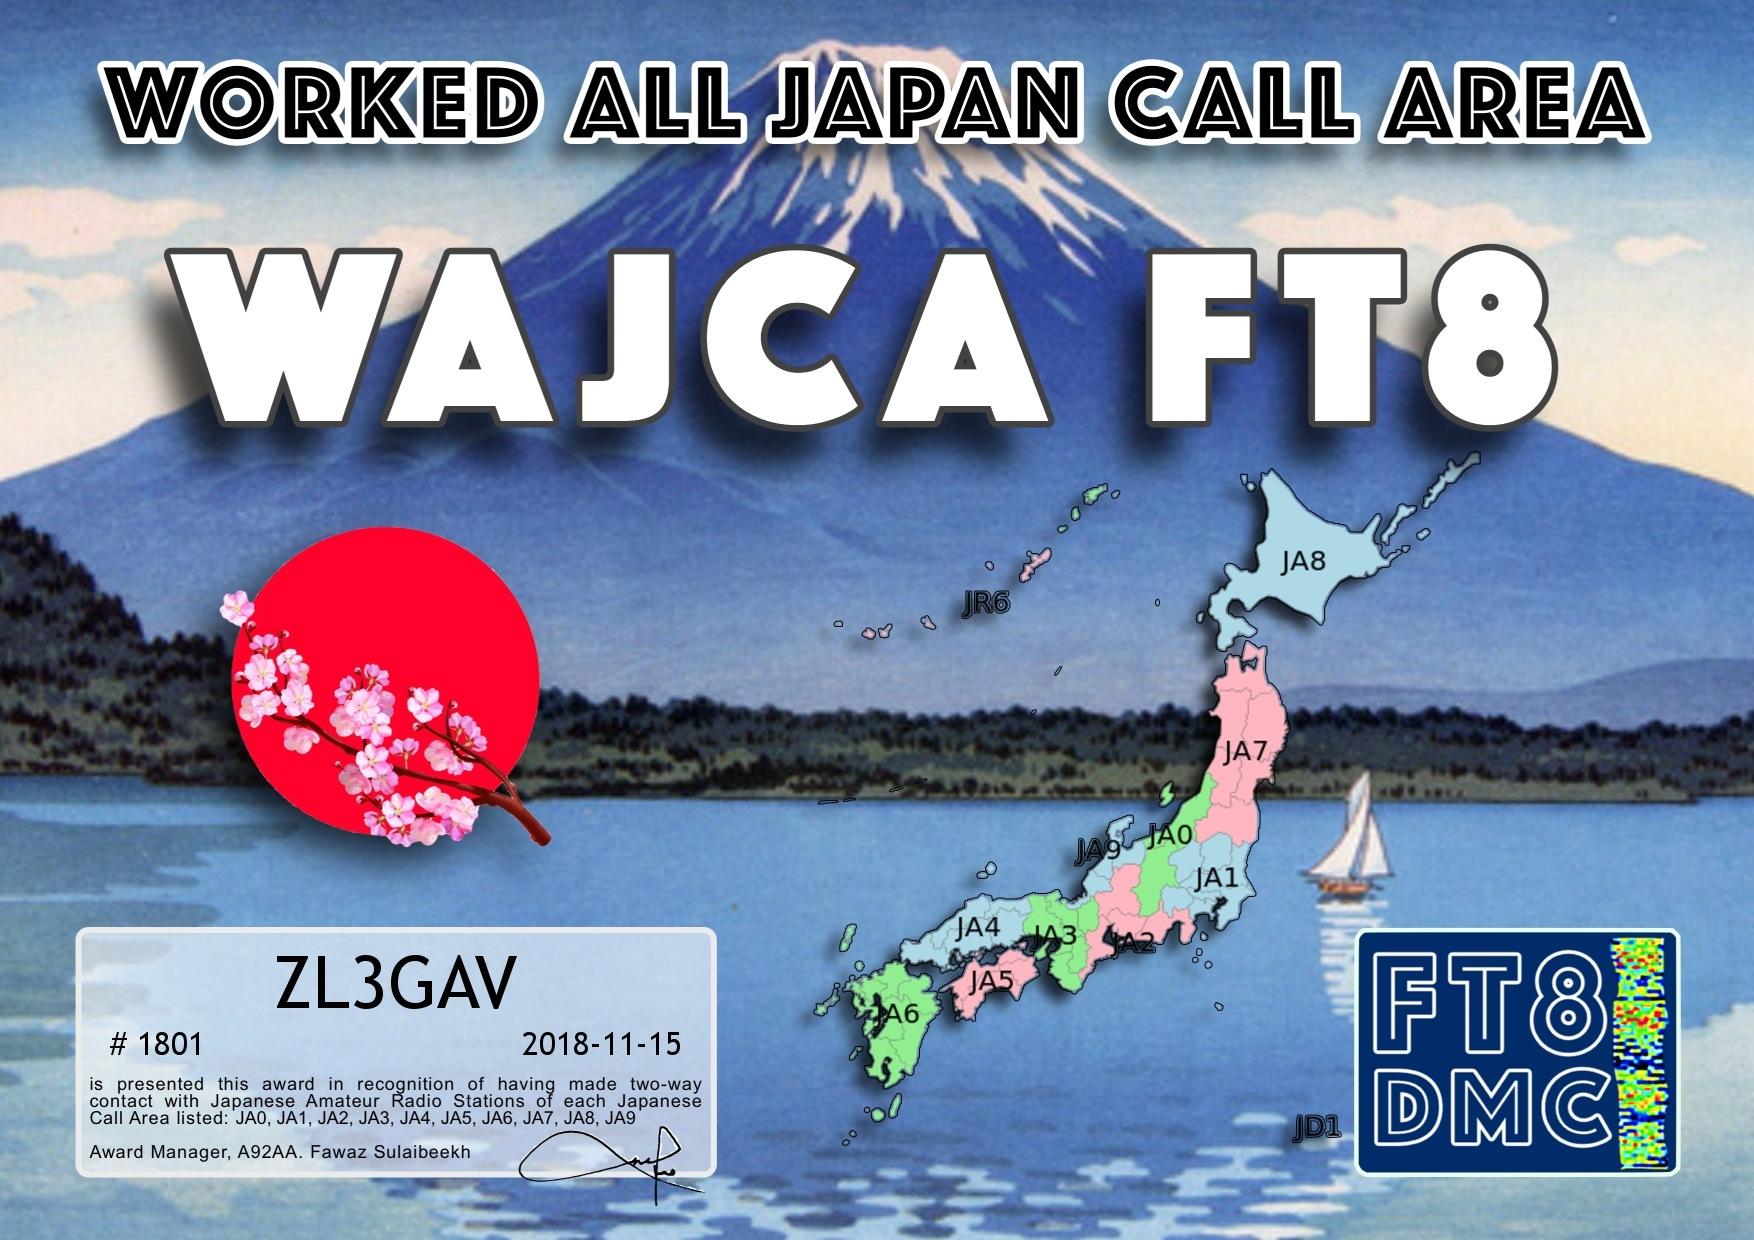 ZL3GAV-WAJCA-WAJCA.jpg